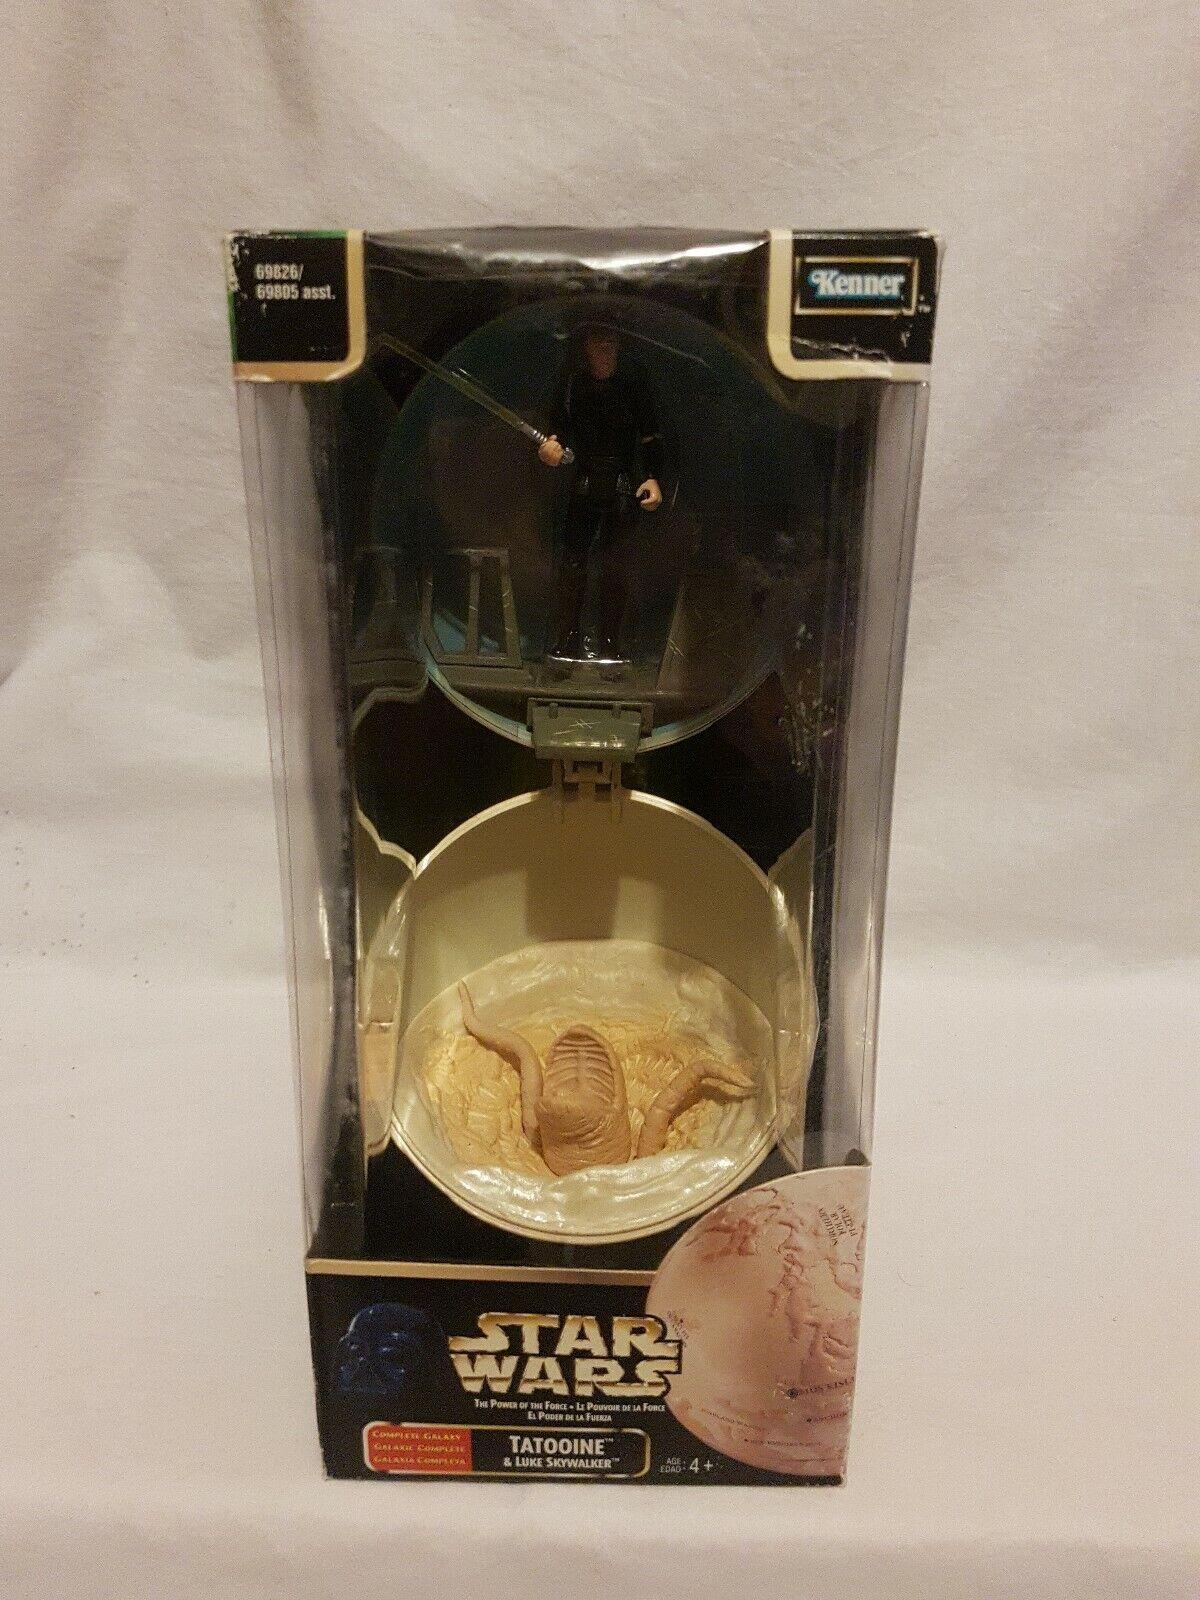 Star Wars Complete Galaxy Tatooine & Luke Skywalker Kenner 1998 Aus Seller